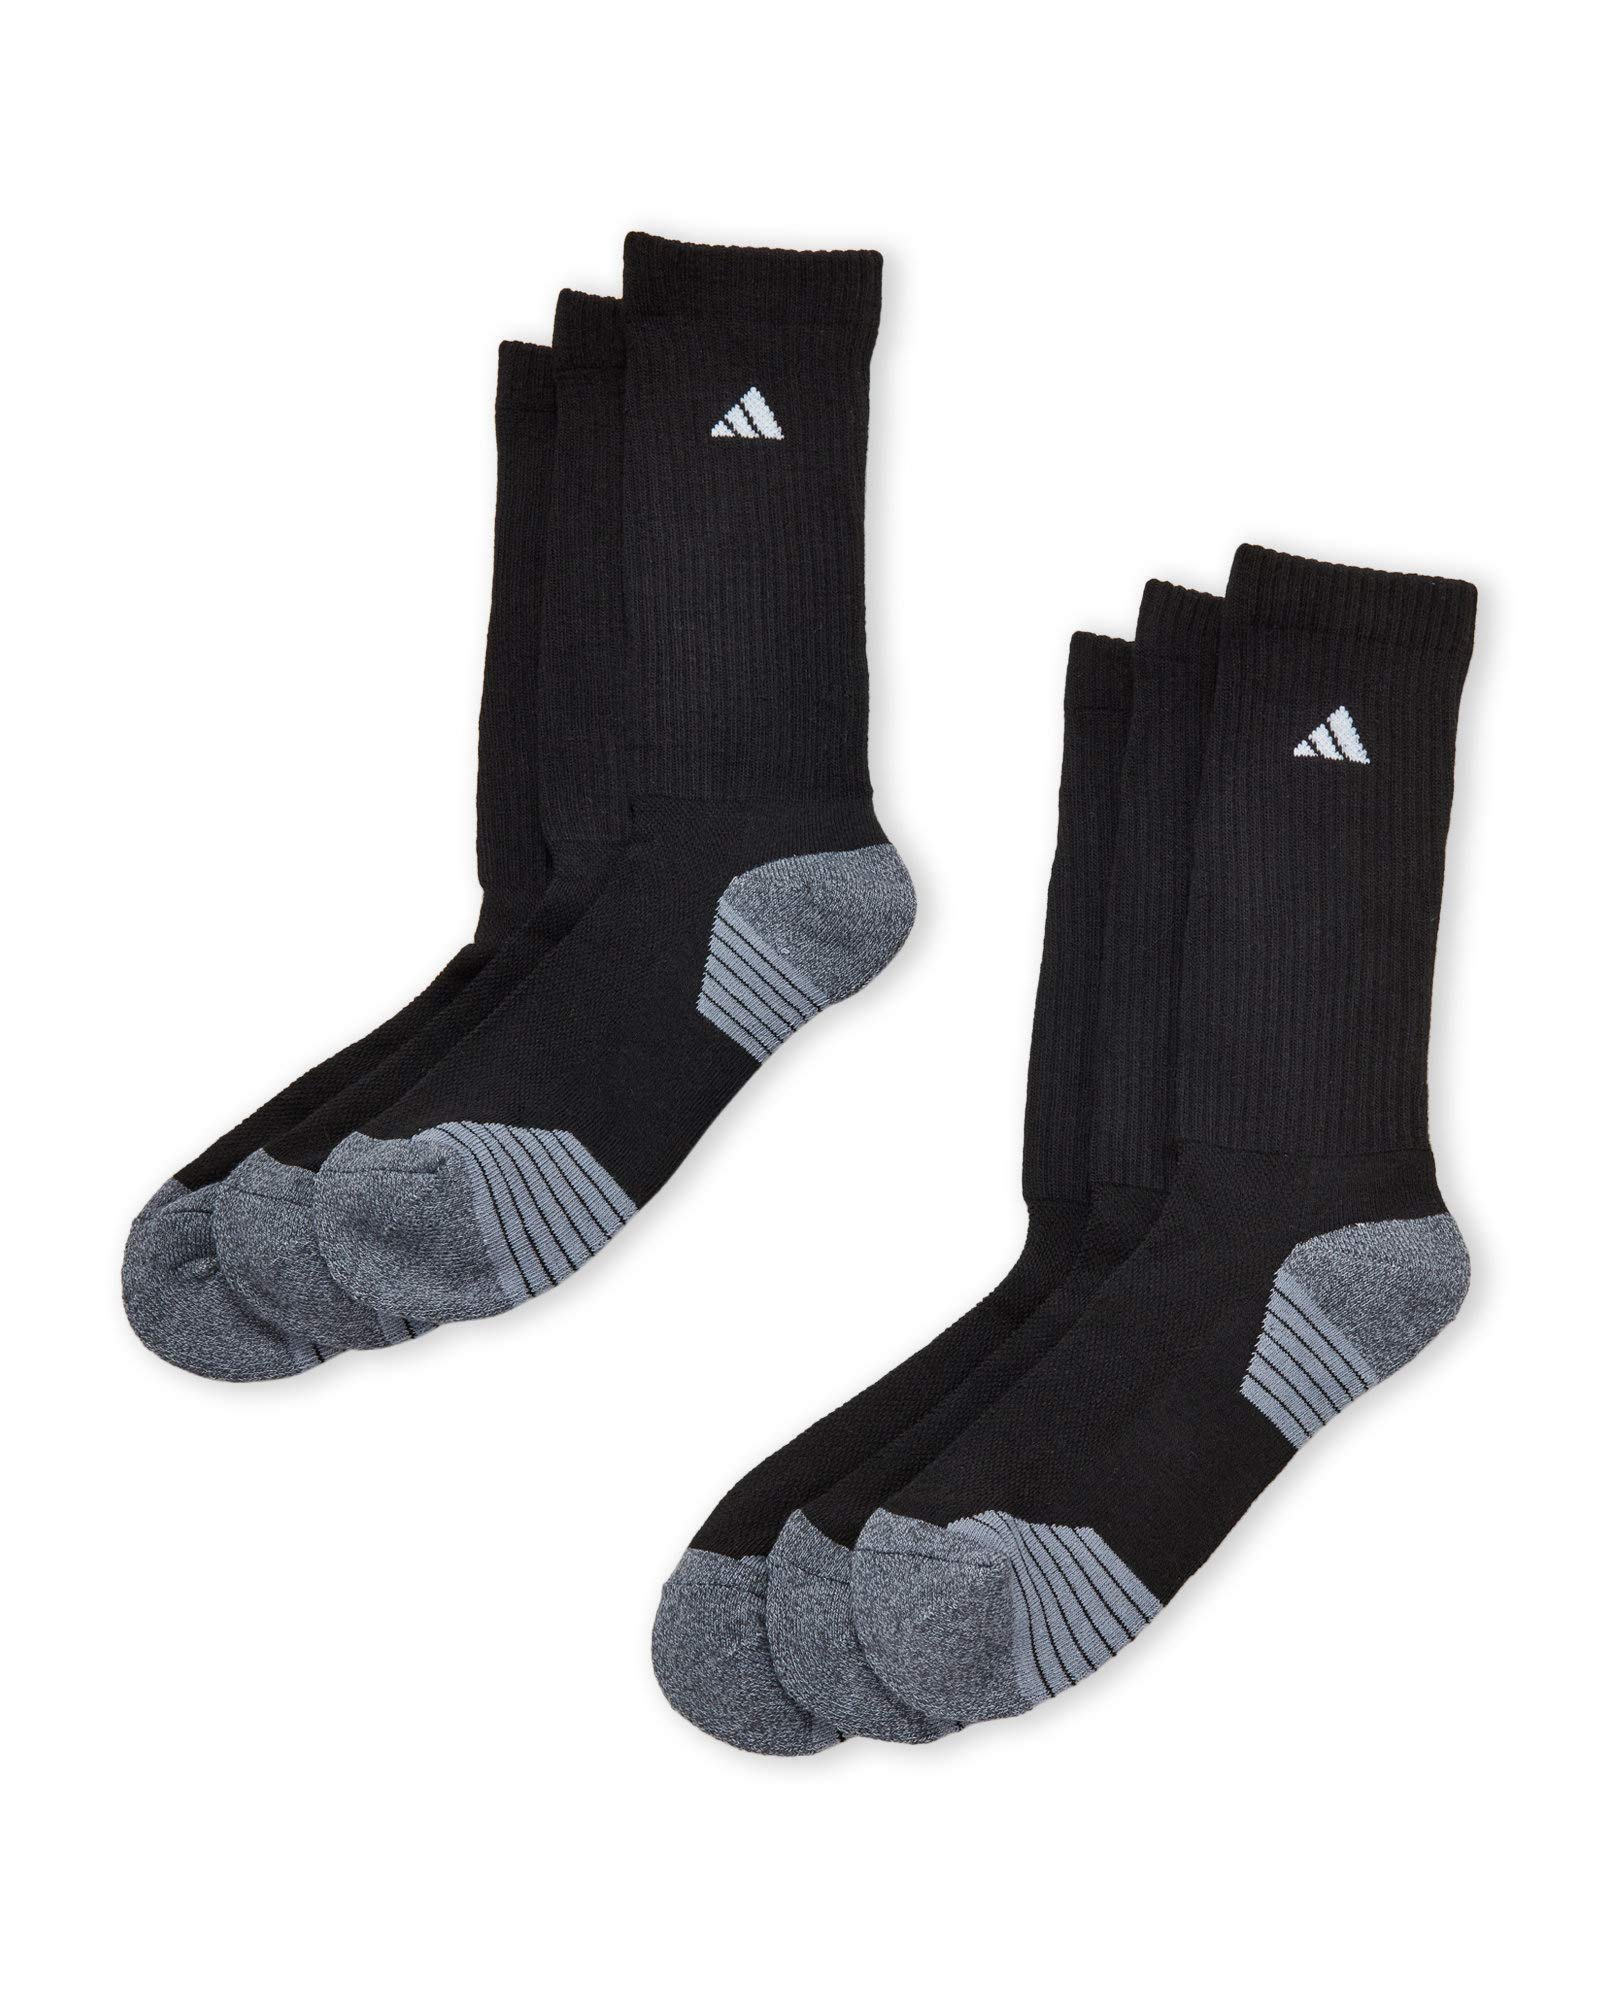 adidas Men's Athletic 6-Pack Crew Socks (Shoe Size 6-12, Black Onyx)